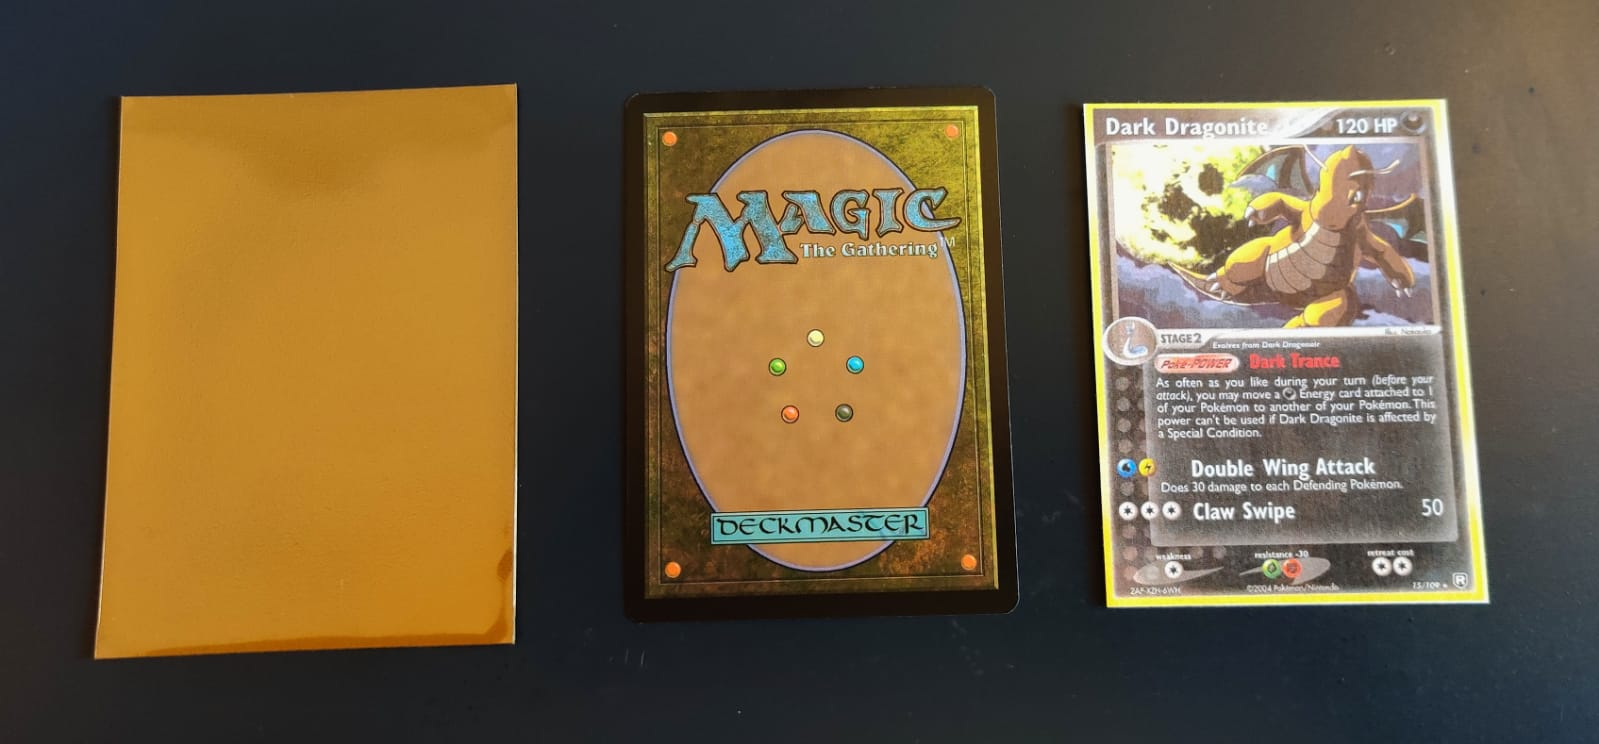 A card sleeve, a Magic the Gathering card upside down and a printed Dark Dragonite card